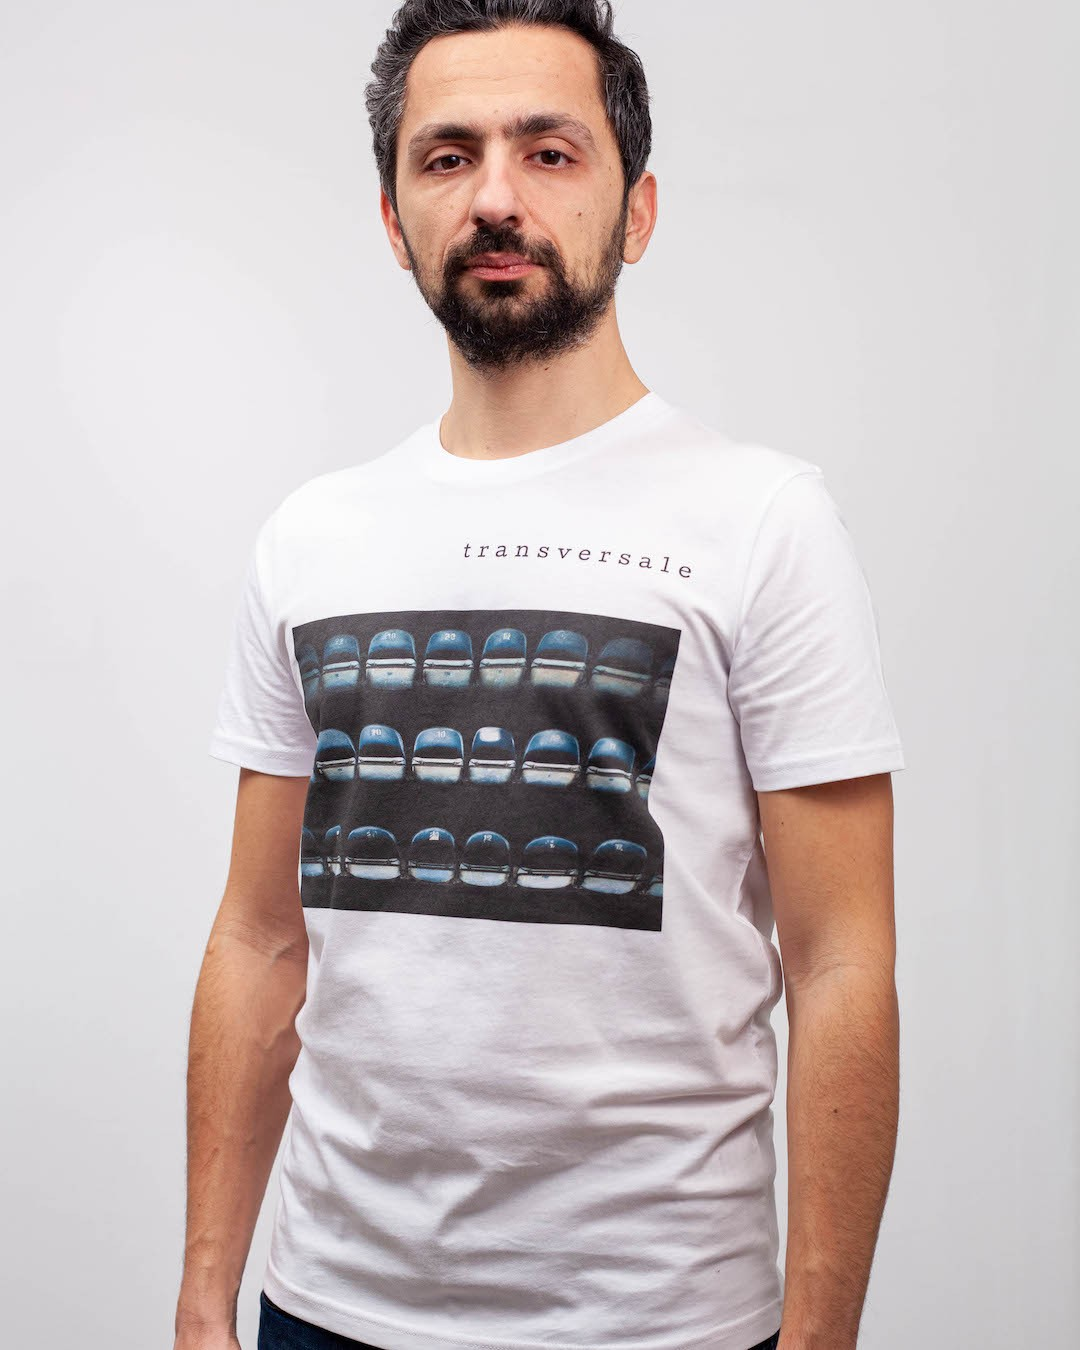 T-shirt Transversale - Stade